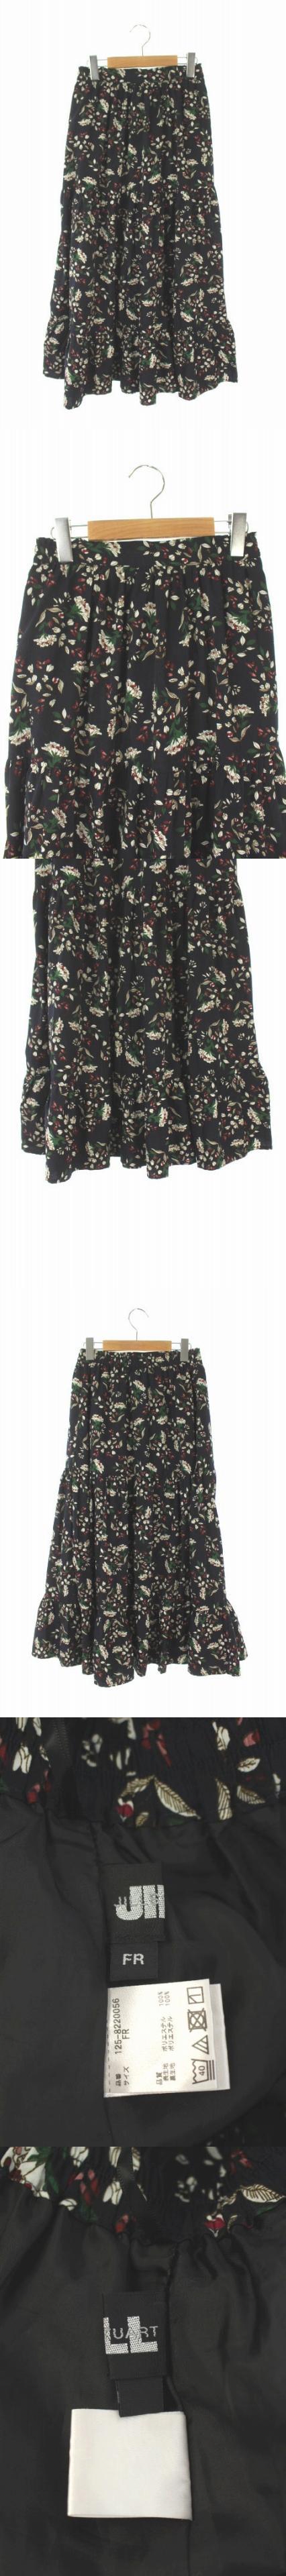 18AW スカート ロング フレア 花柄 FR 黒 /AO ■OS